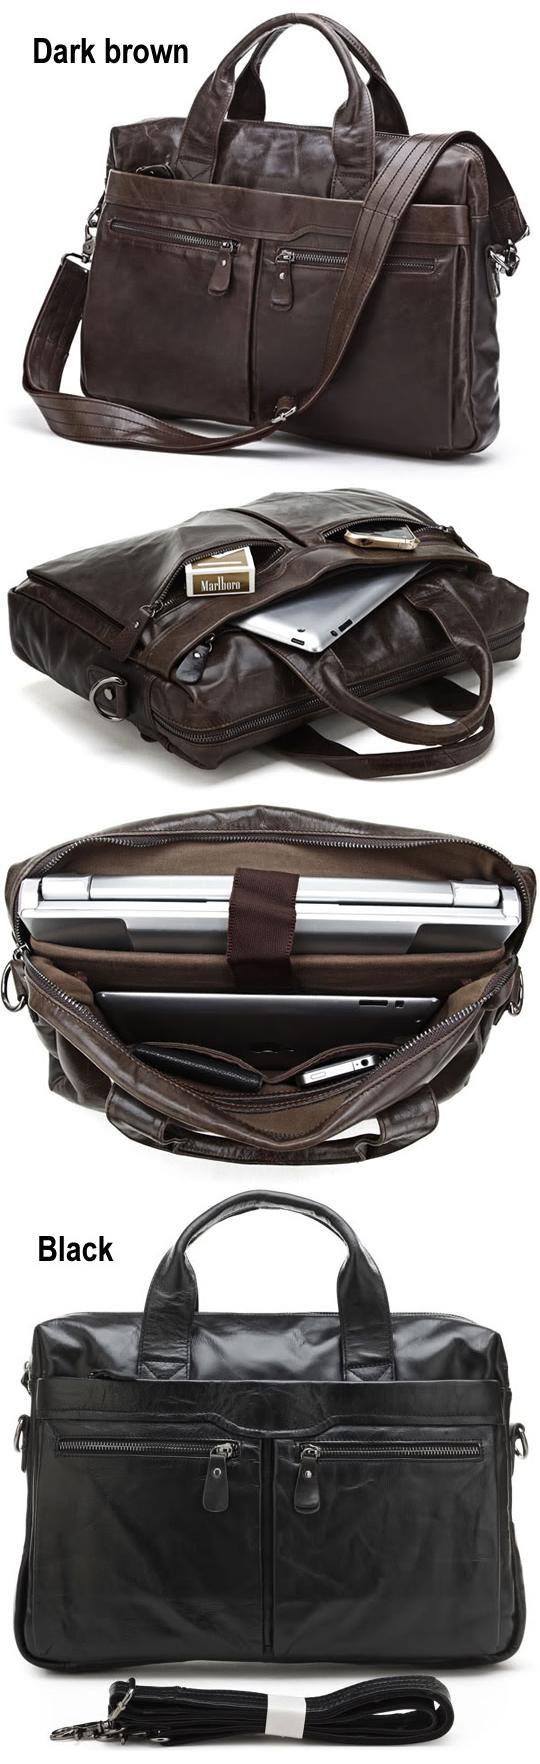 "Handmade Antique Leather Briefcase / 14"" 15"" Laptop or 13"" 15"" MacBook Bag for Men"